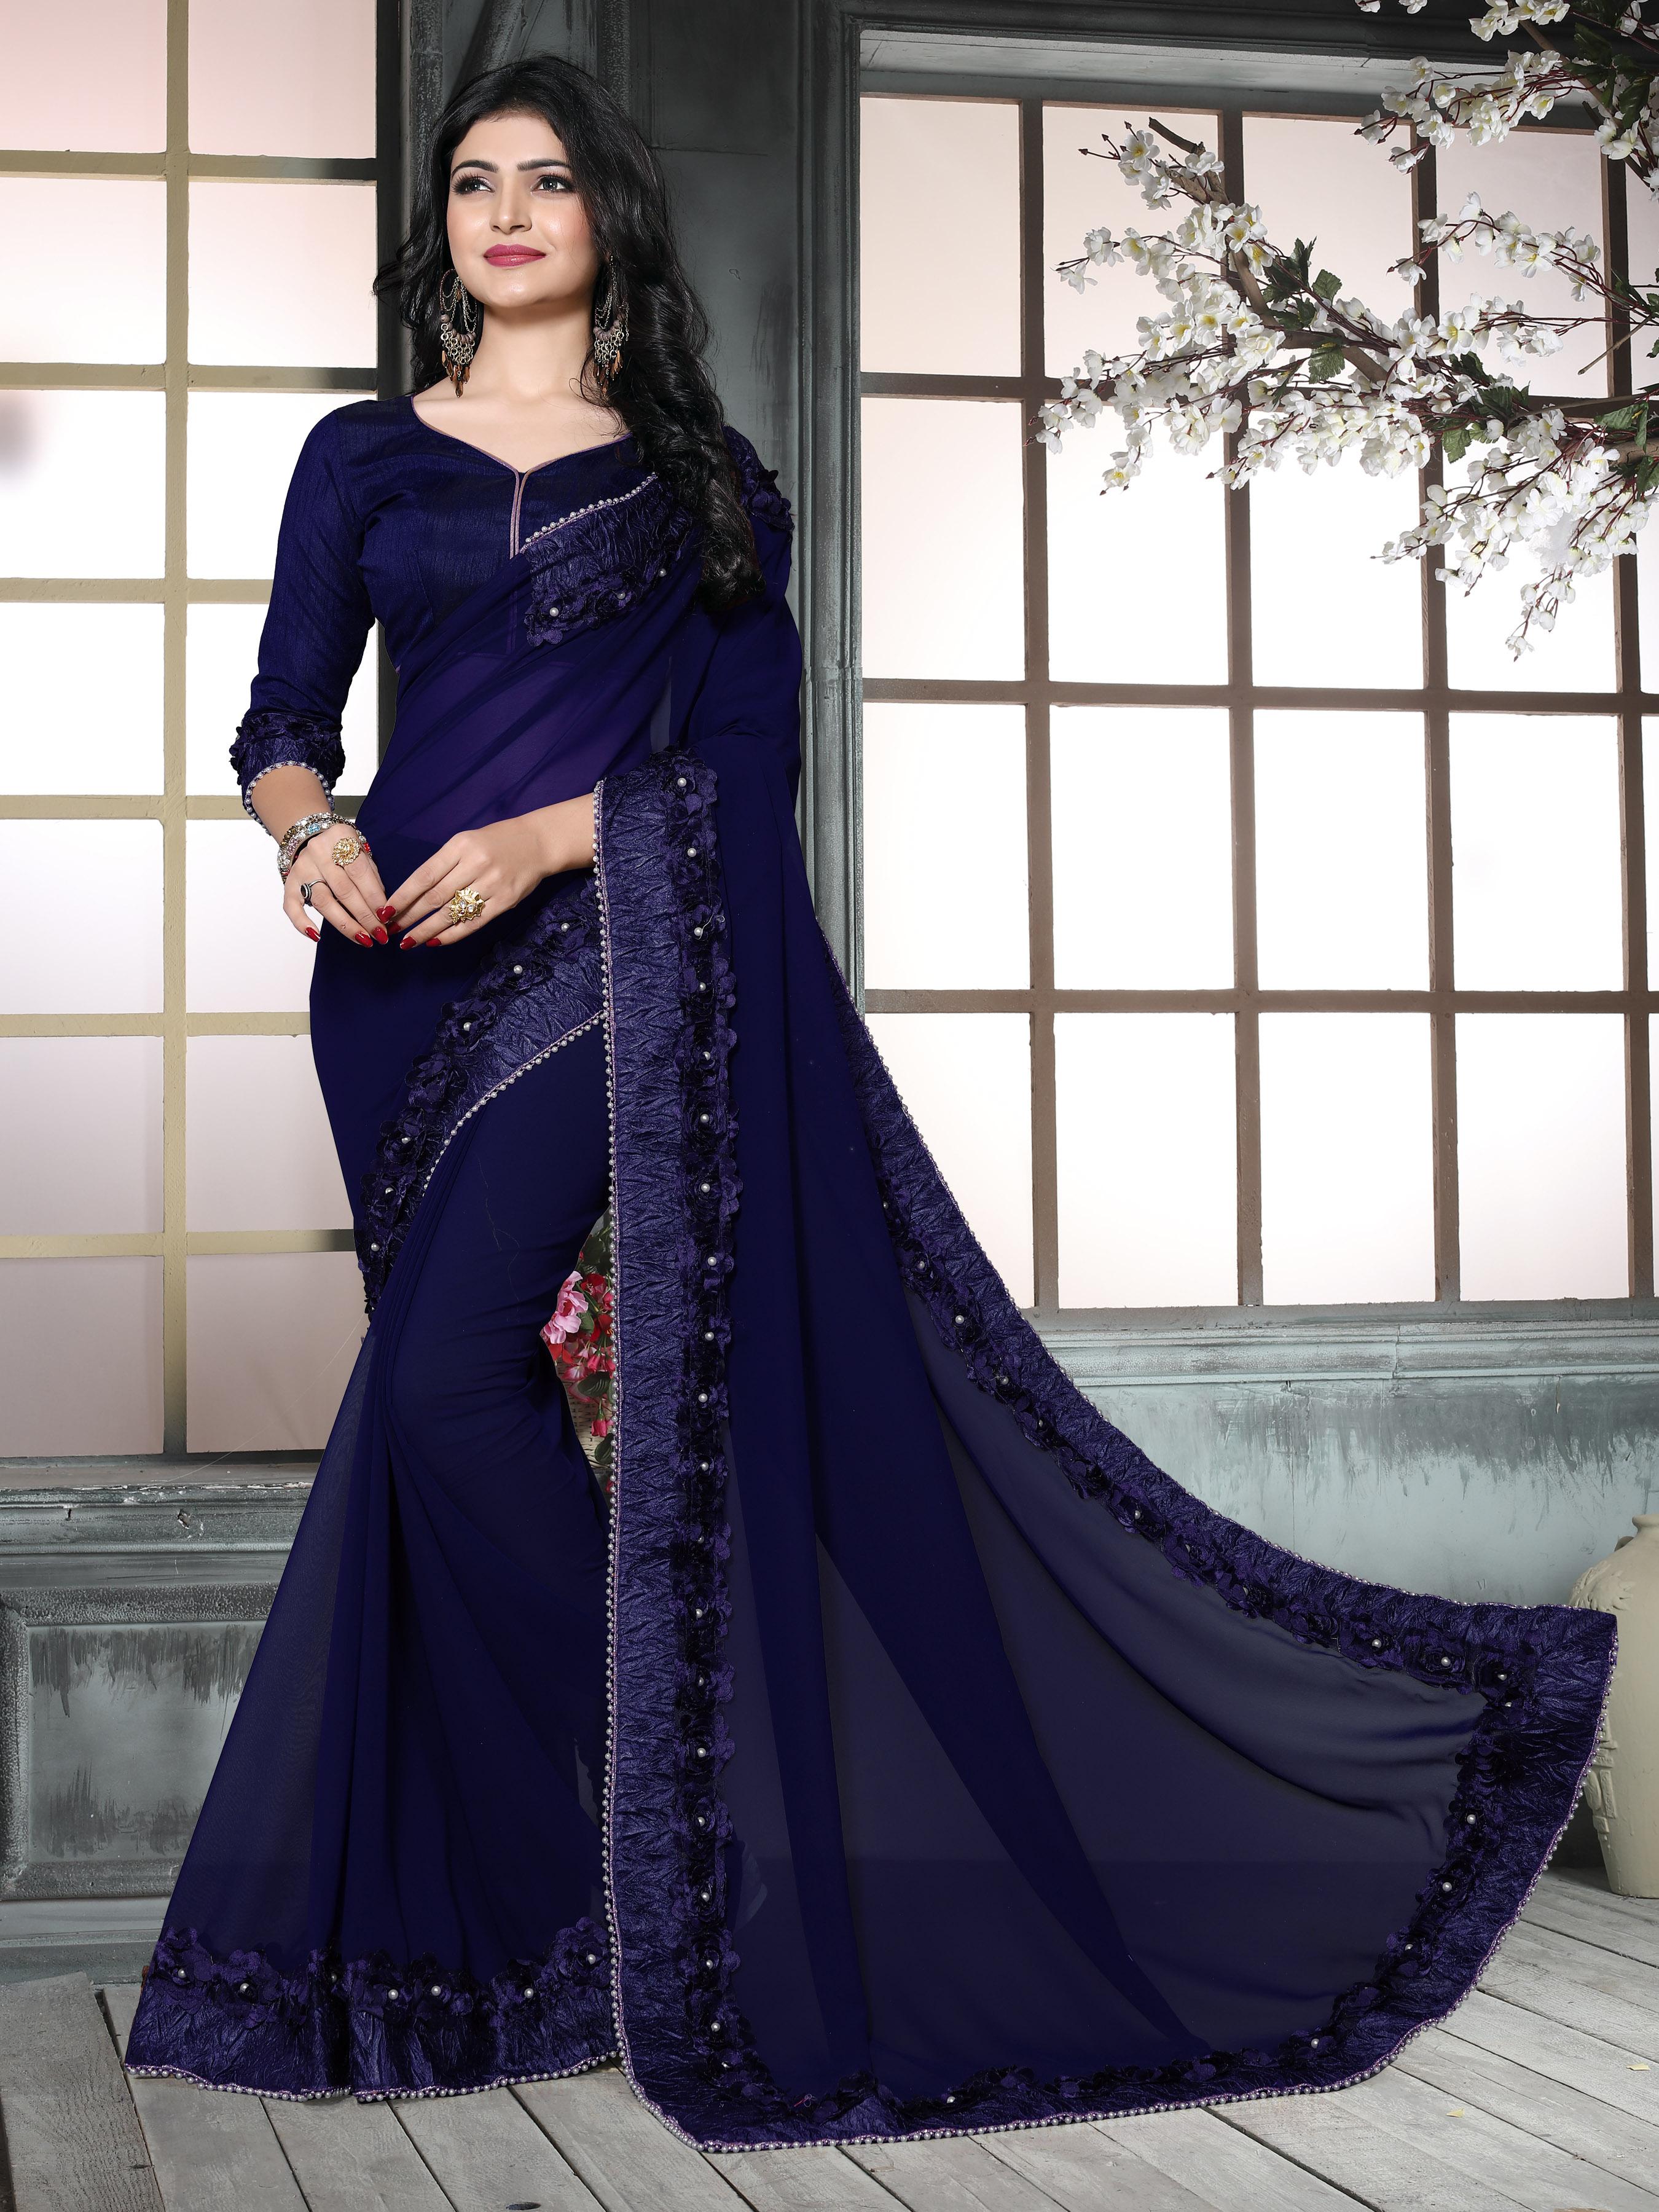 Amazing Blue color Casual Flower Lace saree